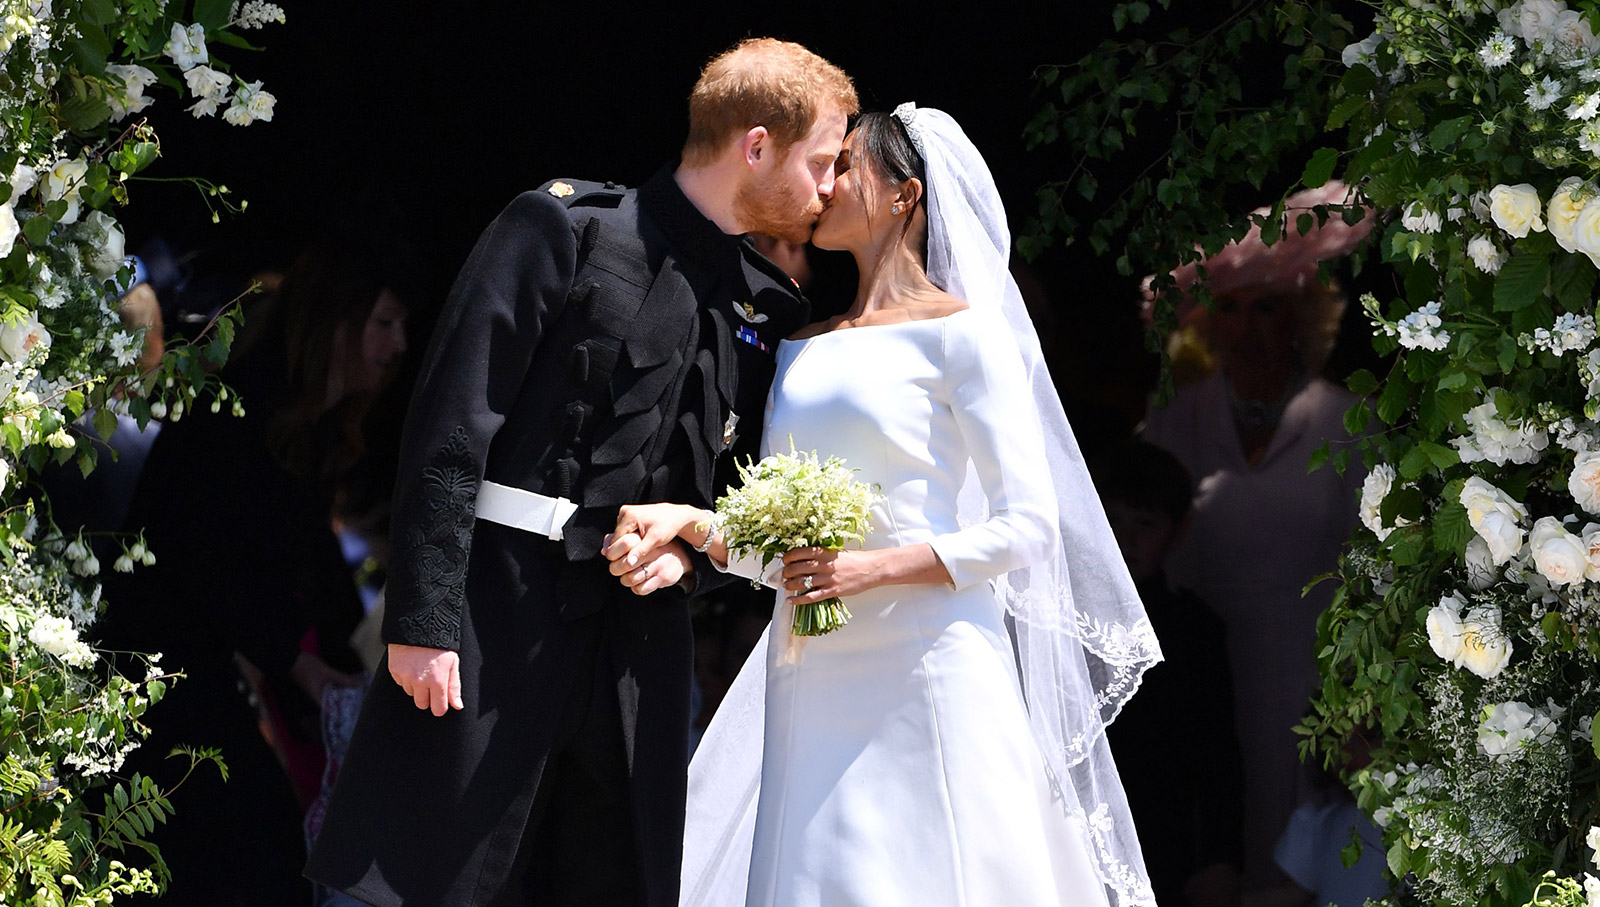 Royal Wedding il bacio degli sposi